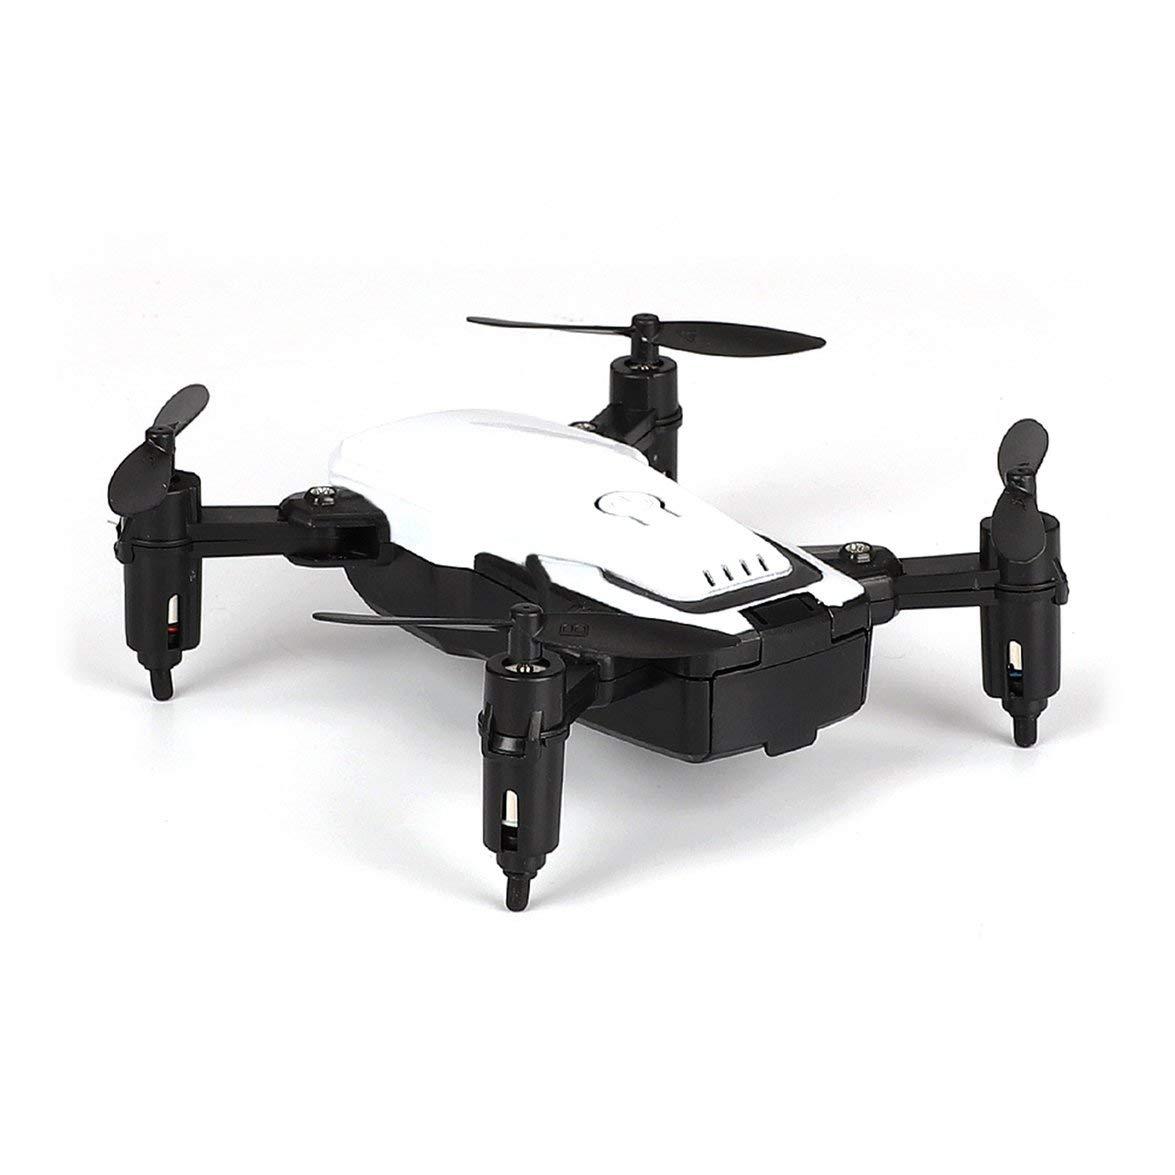 Kongqiabona LF606 3 Pilas dron con cámara 720P FPV cuadricóptero ...